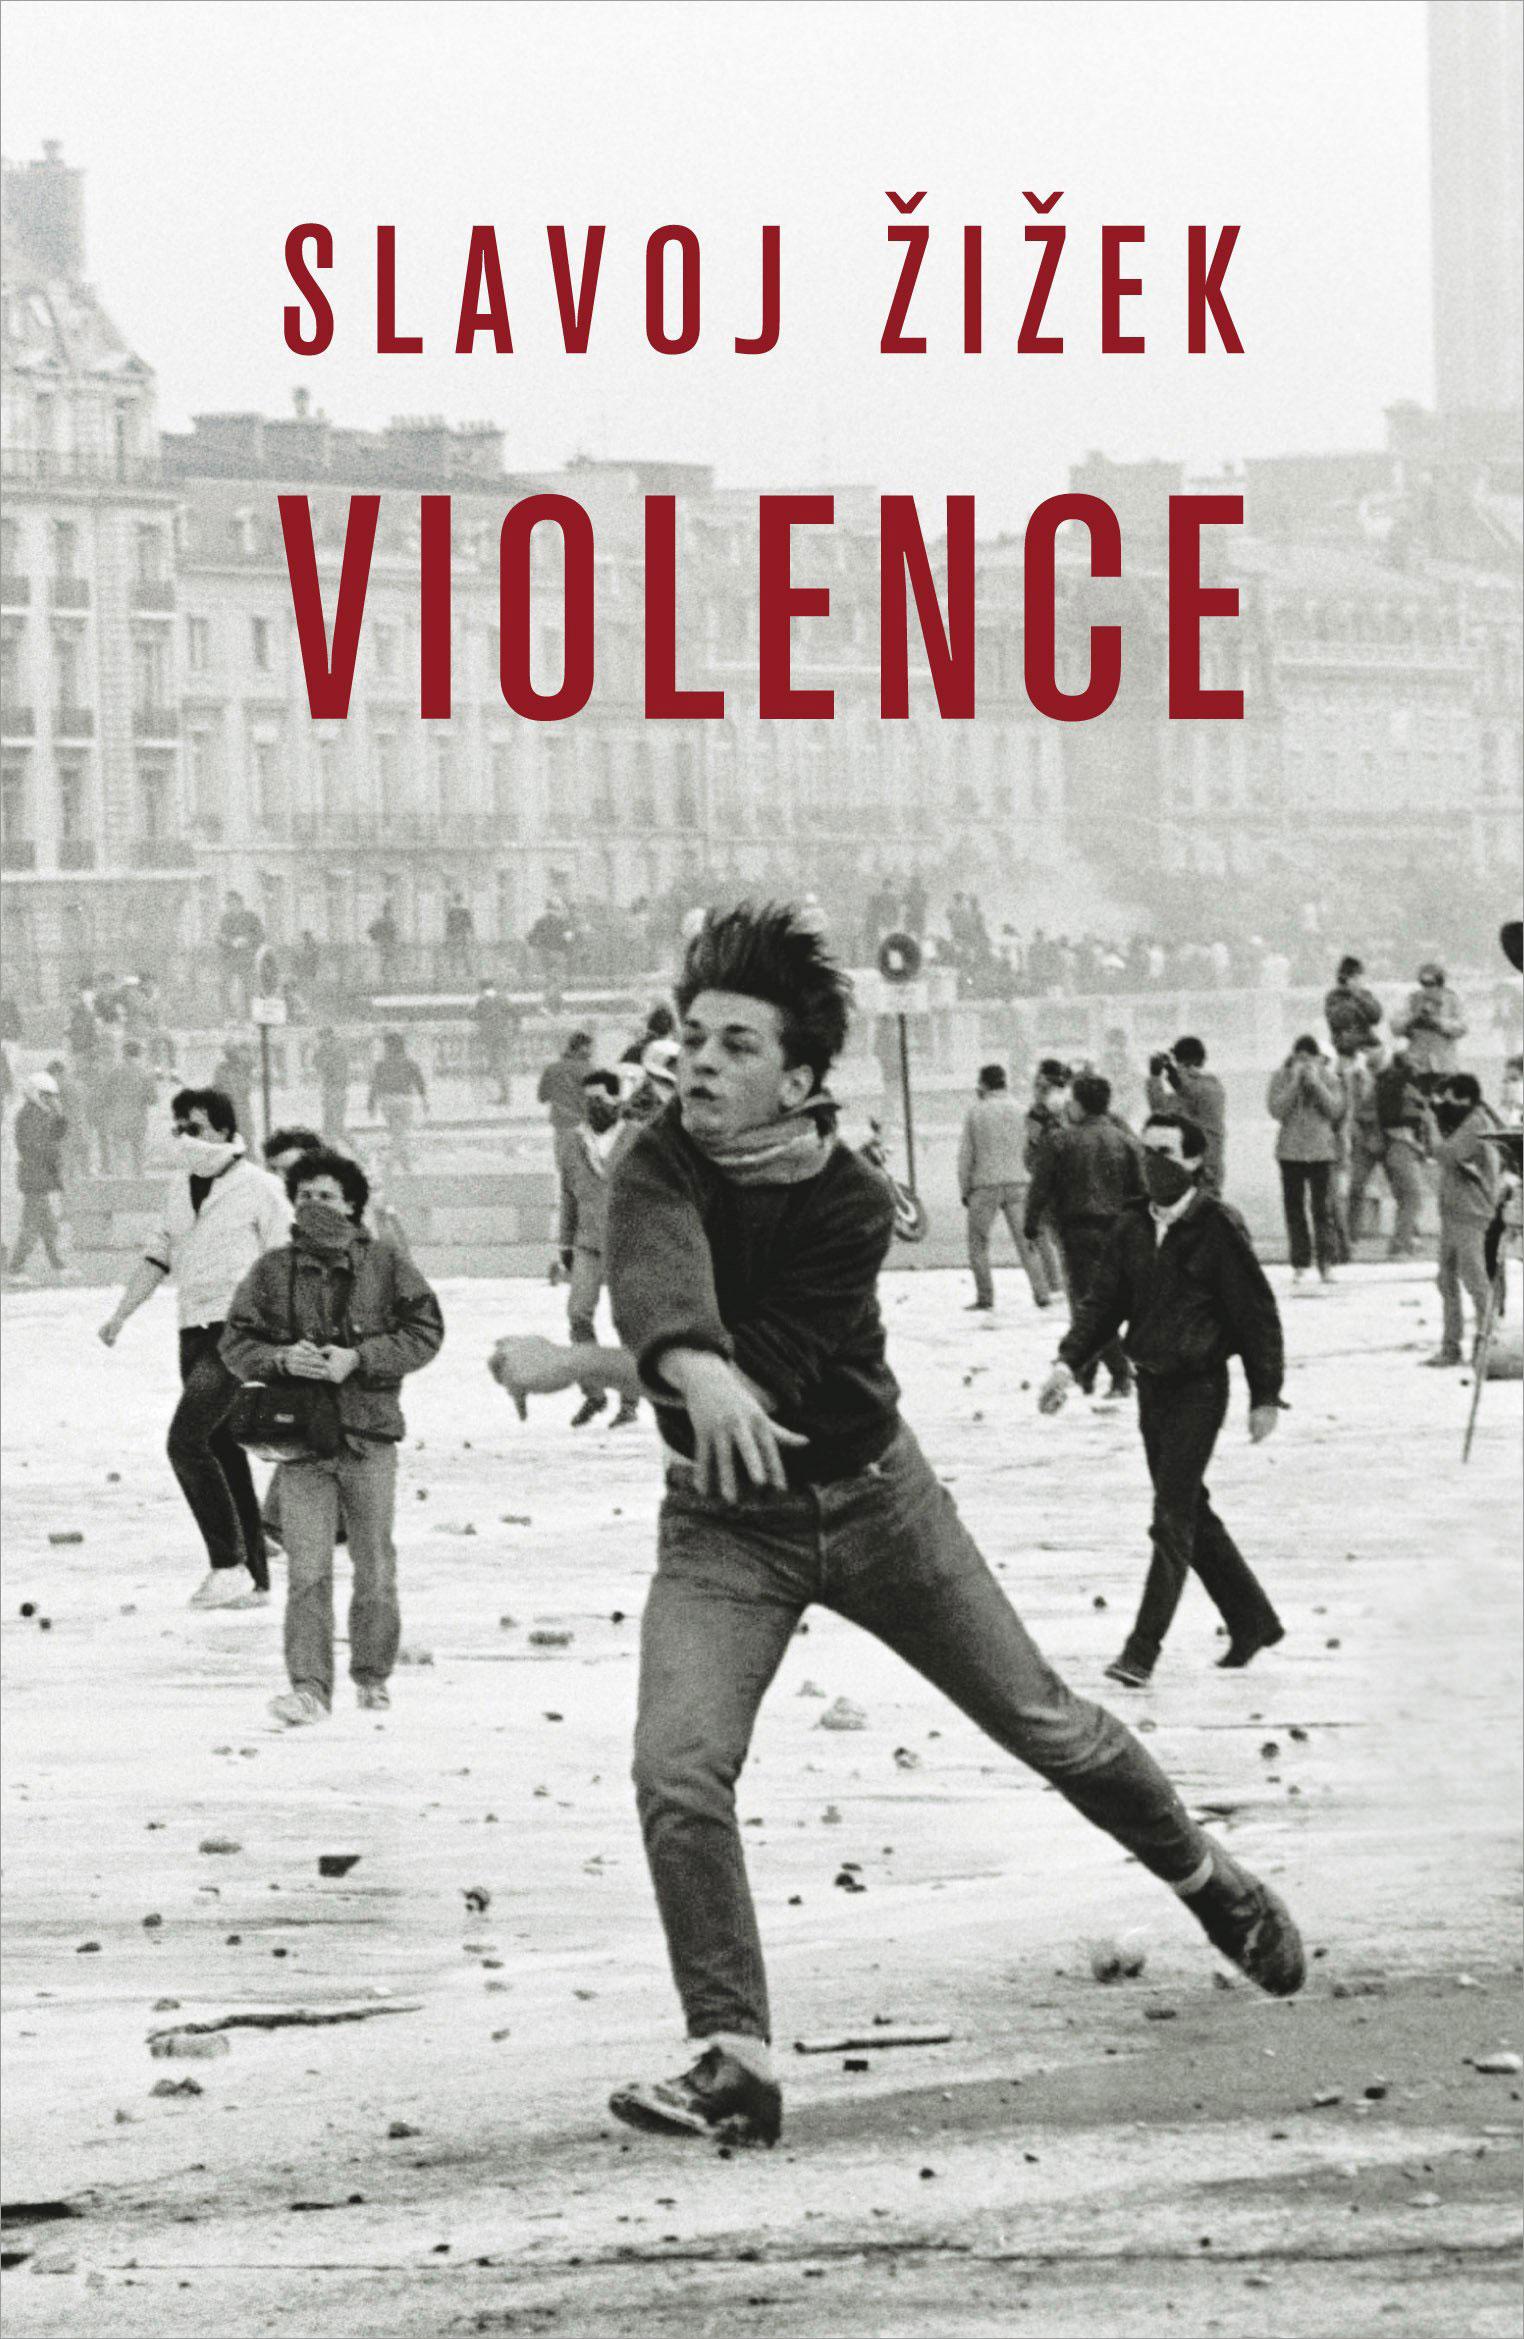 Slavoj Zizek - Violence